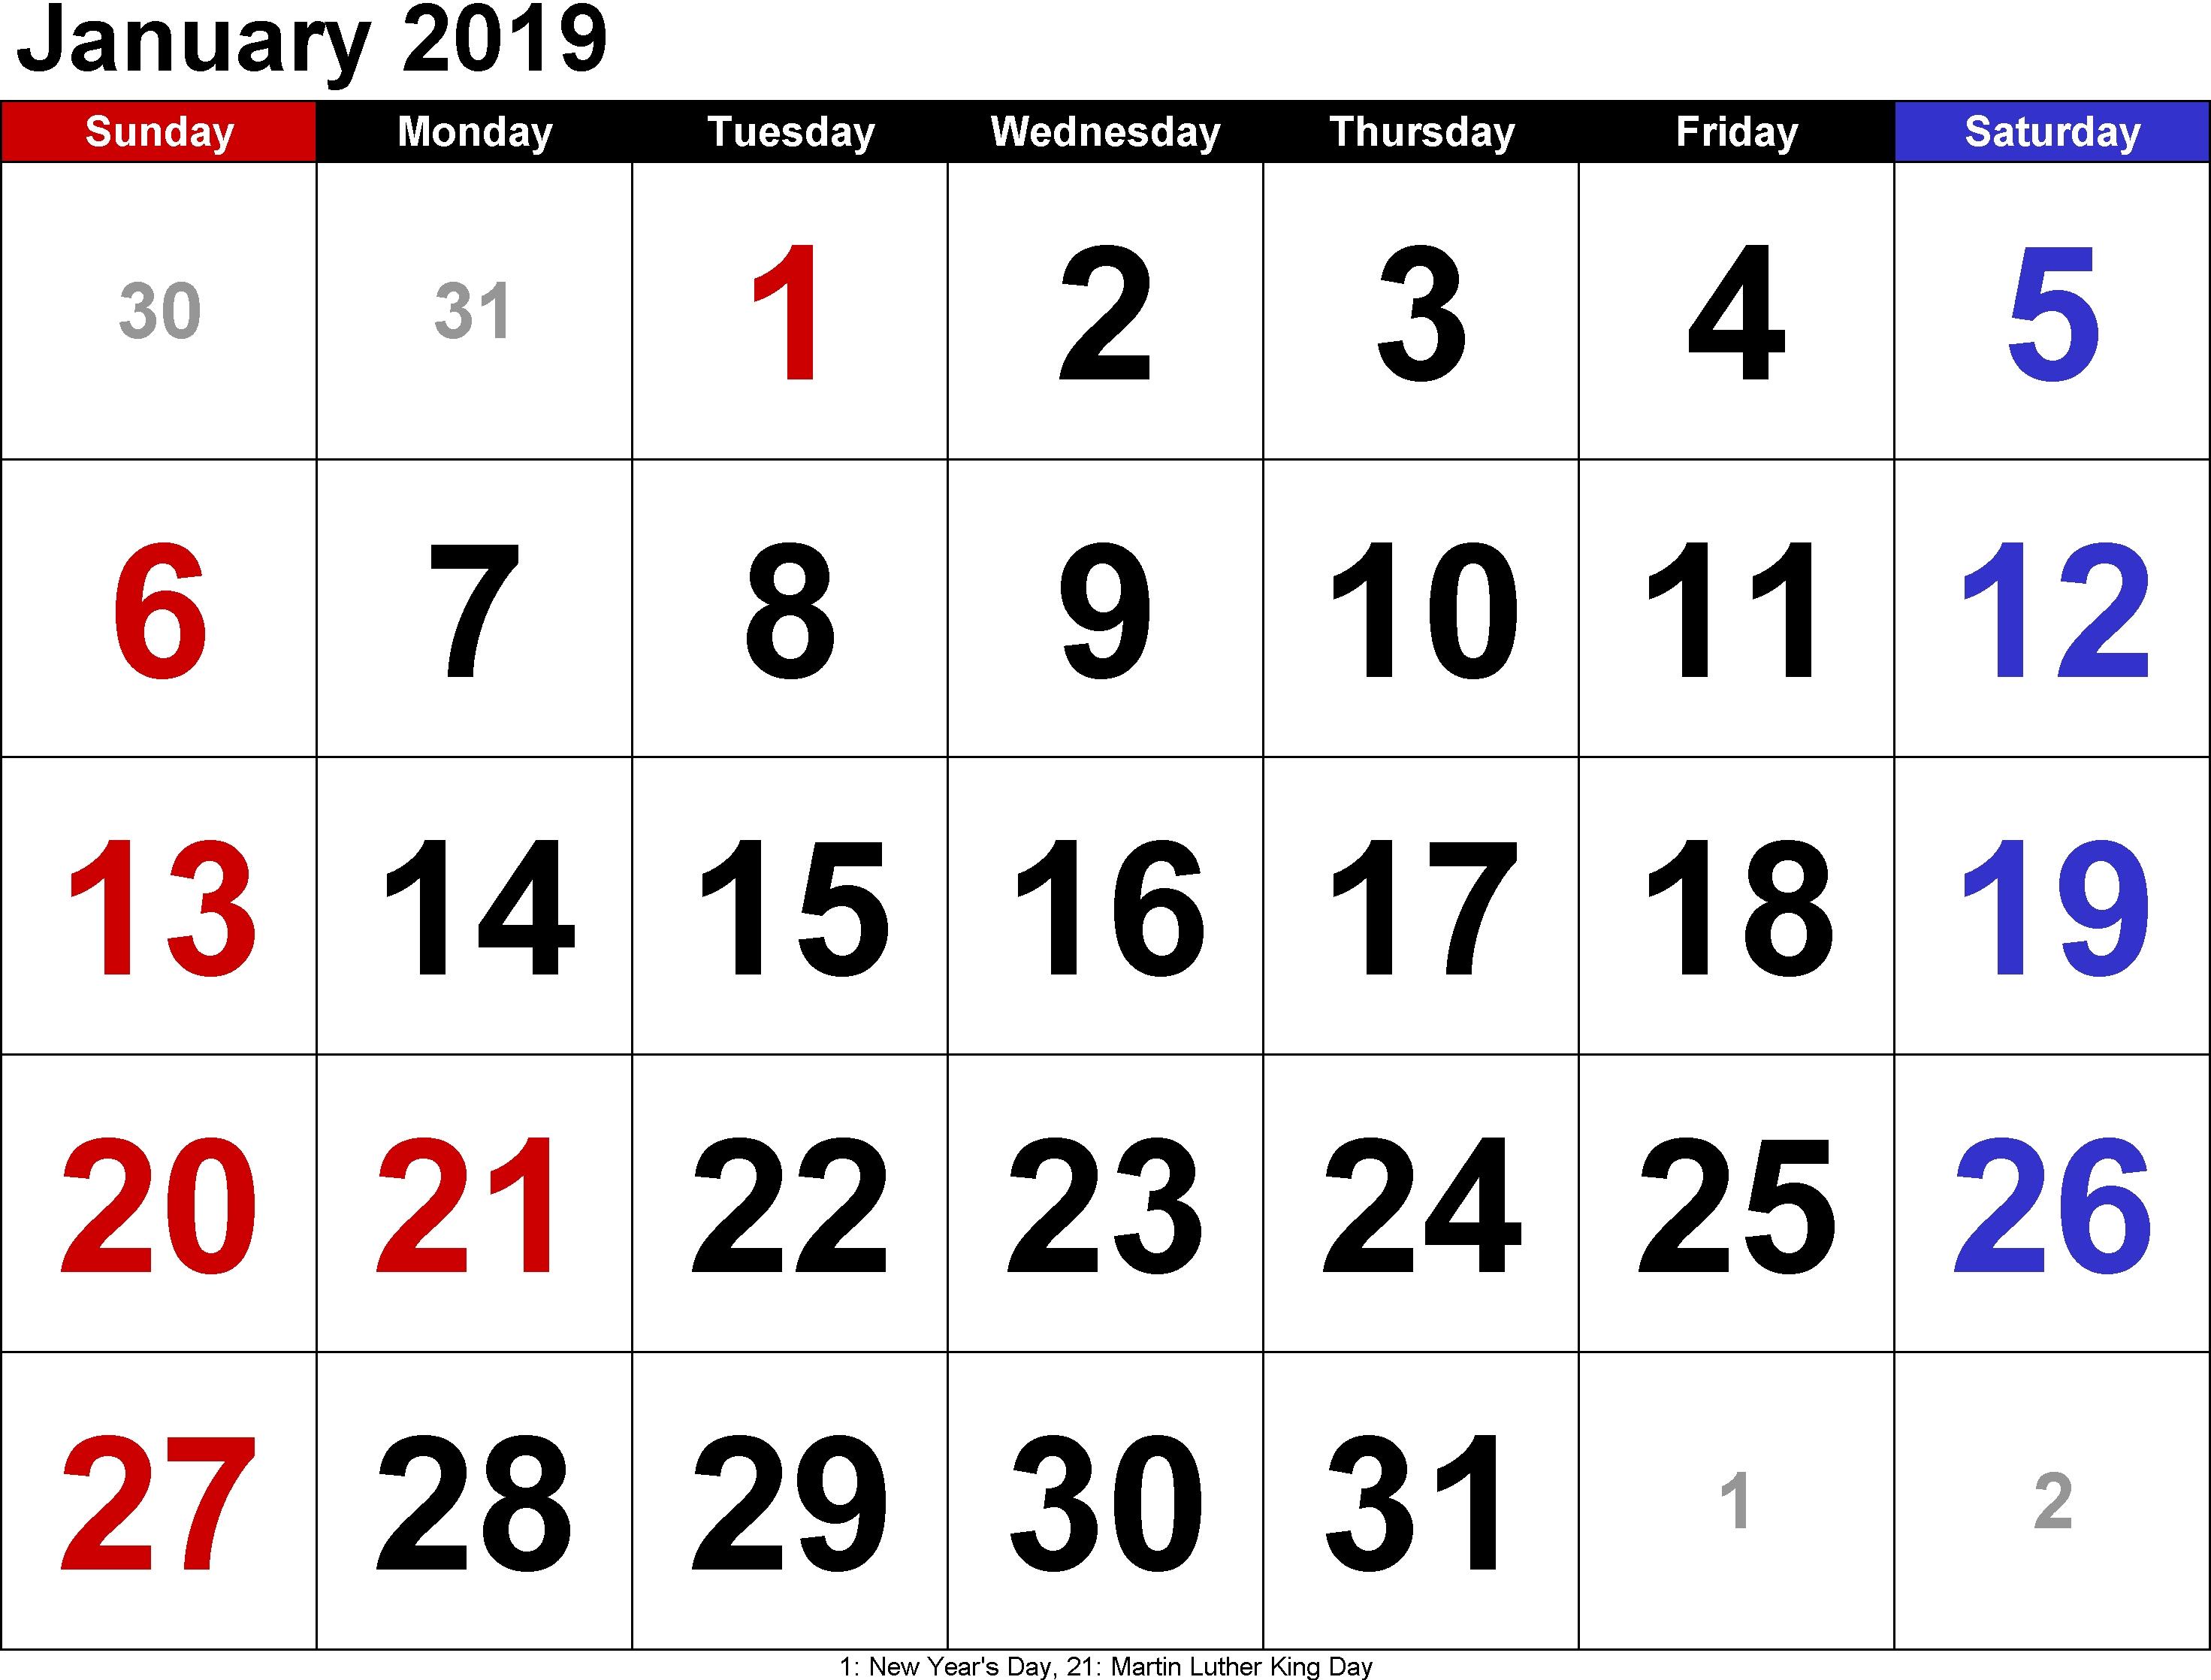 Free January Calendar 2019 | January 2019 Calendar | Pinterest January 2 2019 Calendar